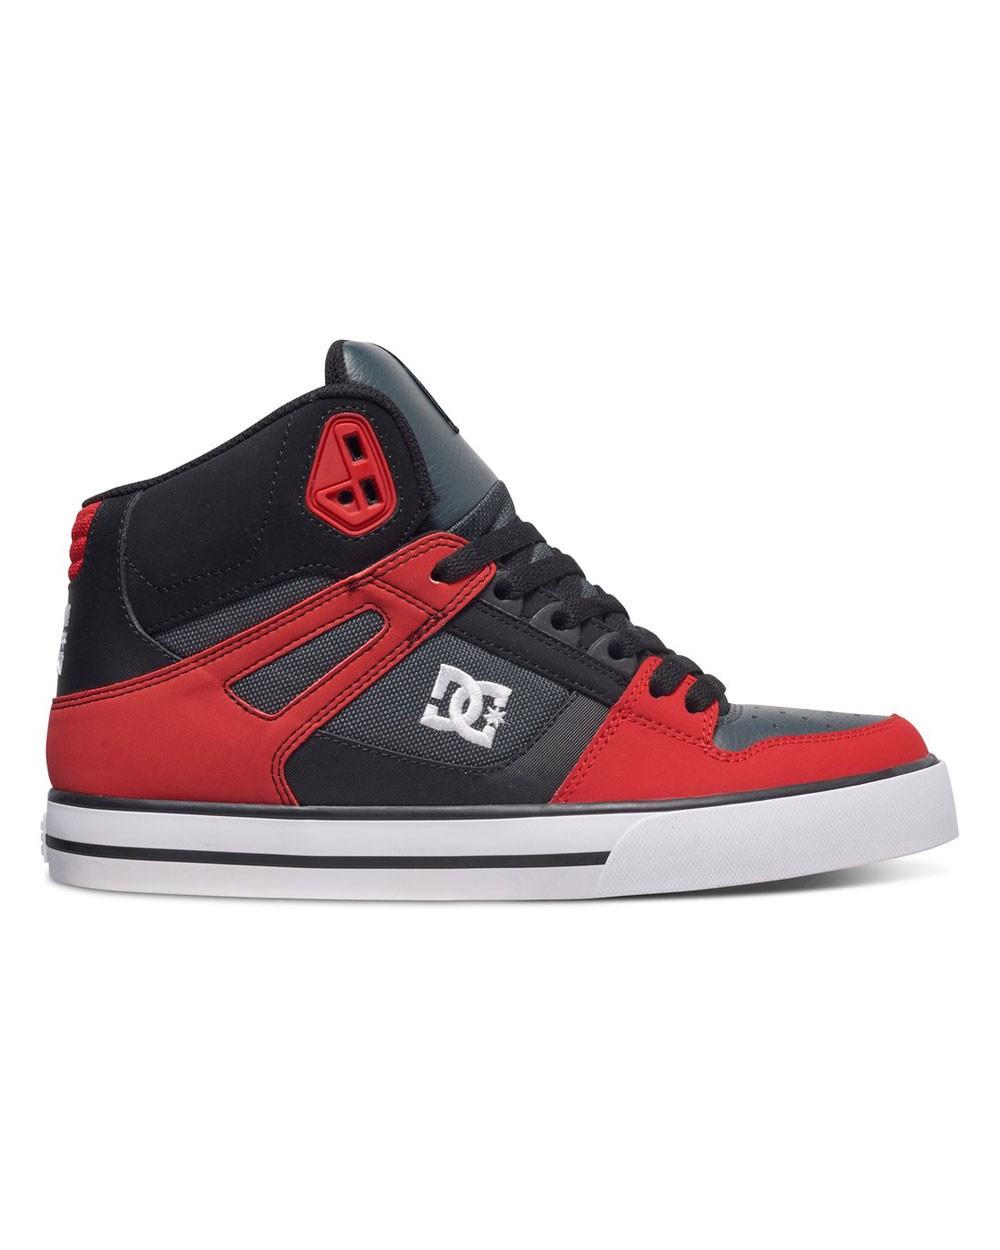 Обувь DC Spartan grey dark red